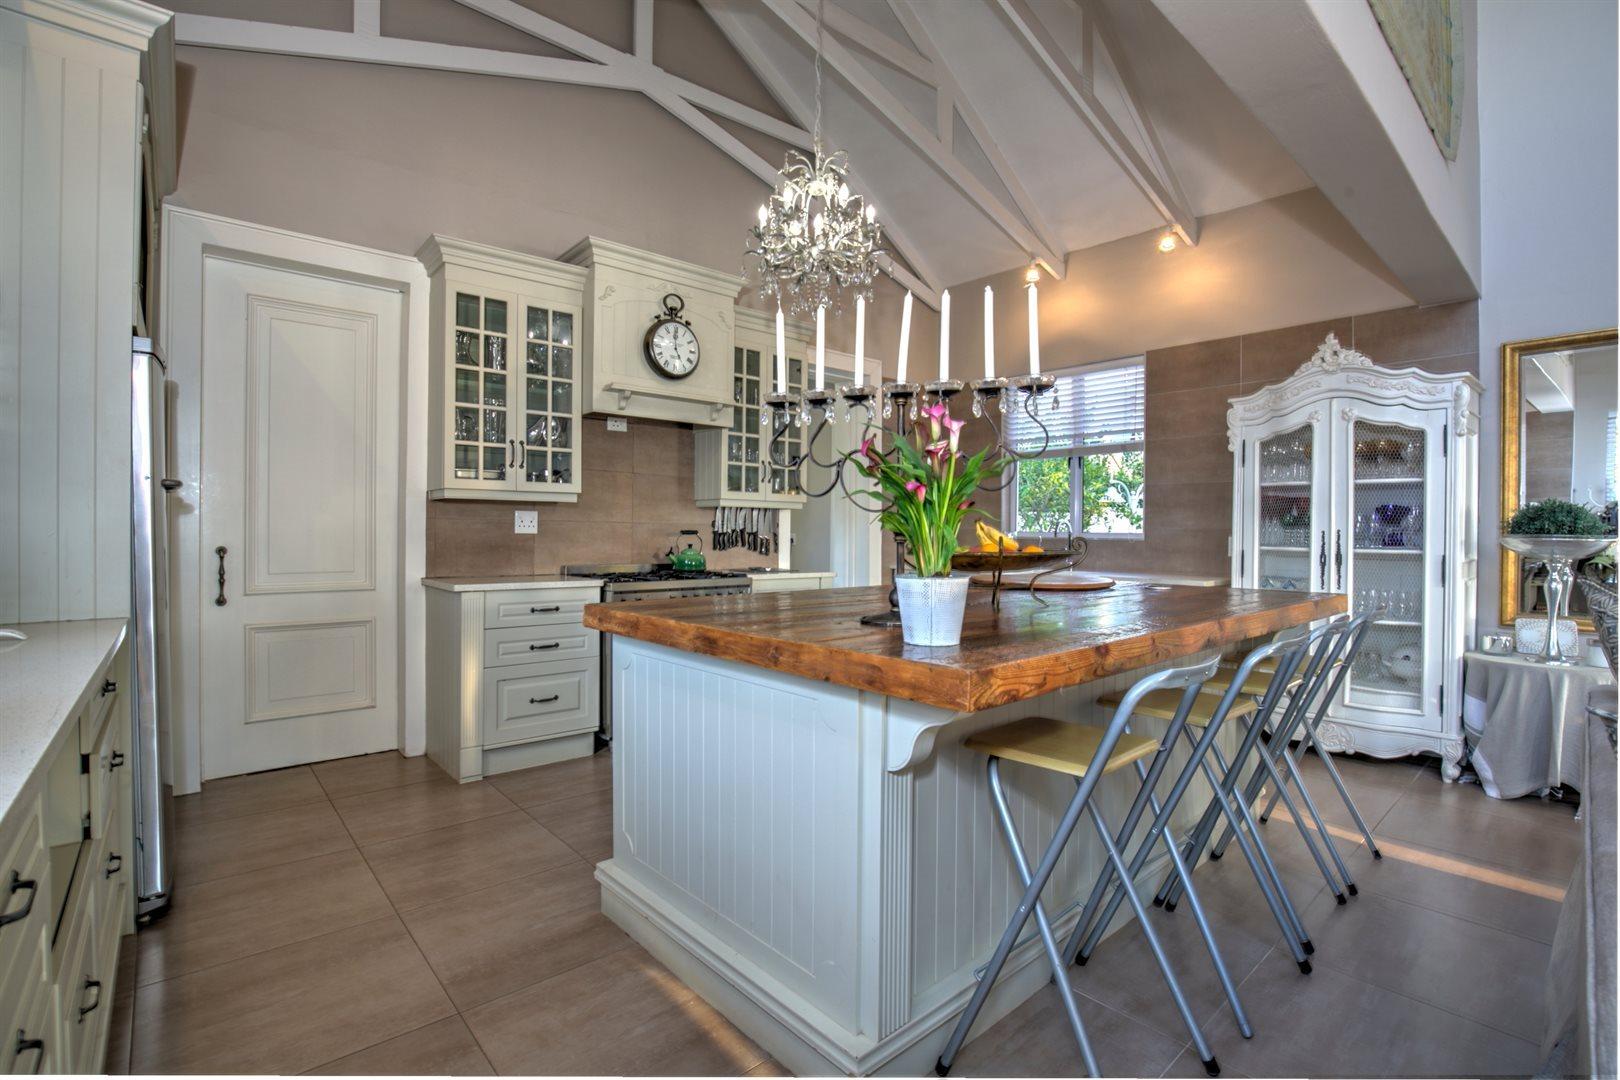 Southdowns Estate property for sale. Ref No: 13622989. Picture no 9